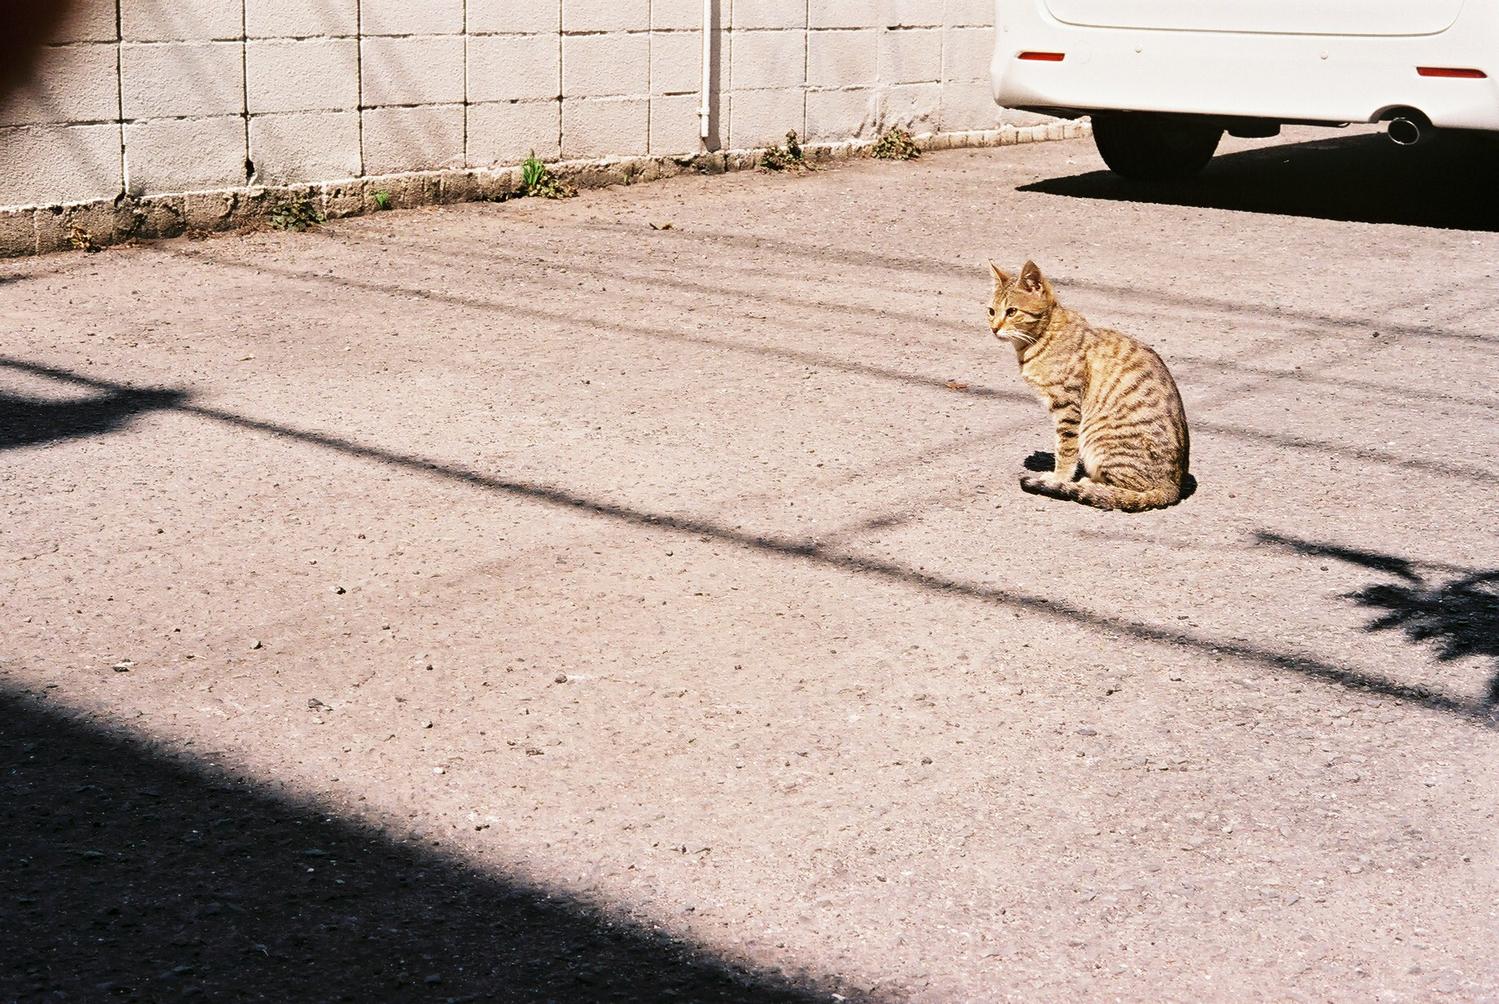 ◻︎ 猫背を矯正して姿勢を正す